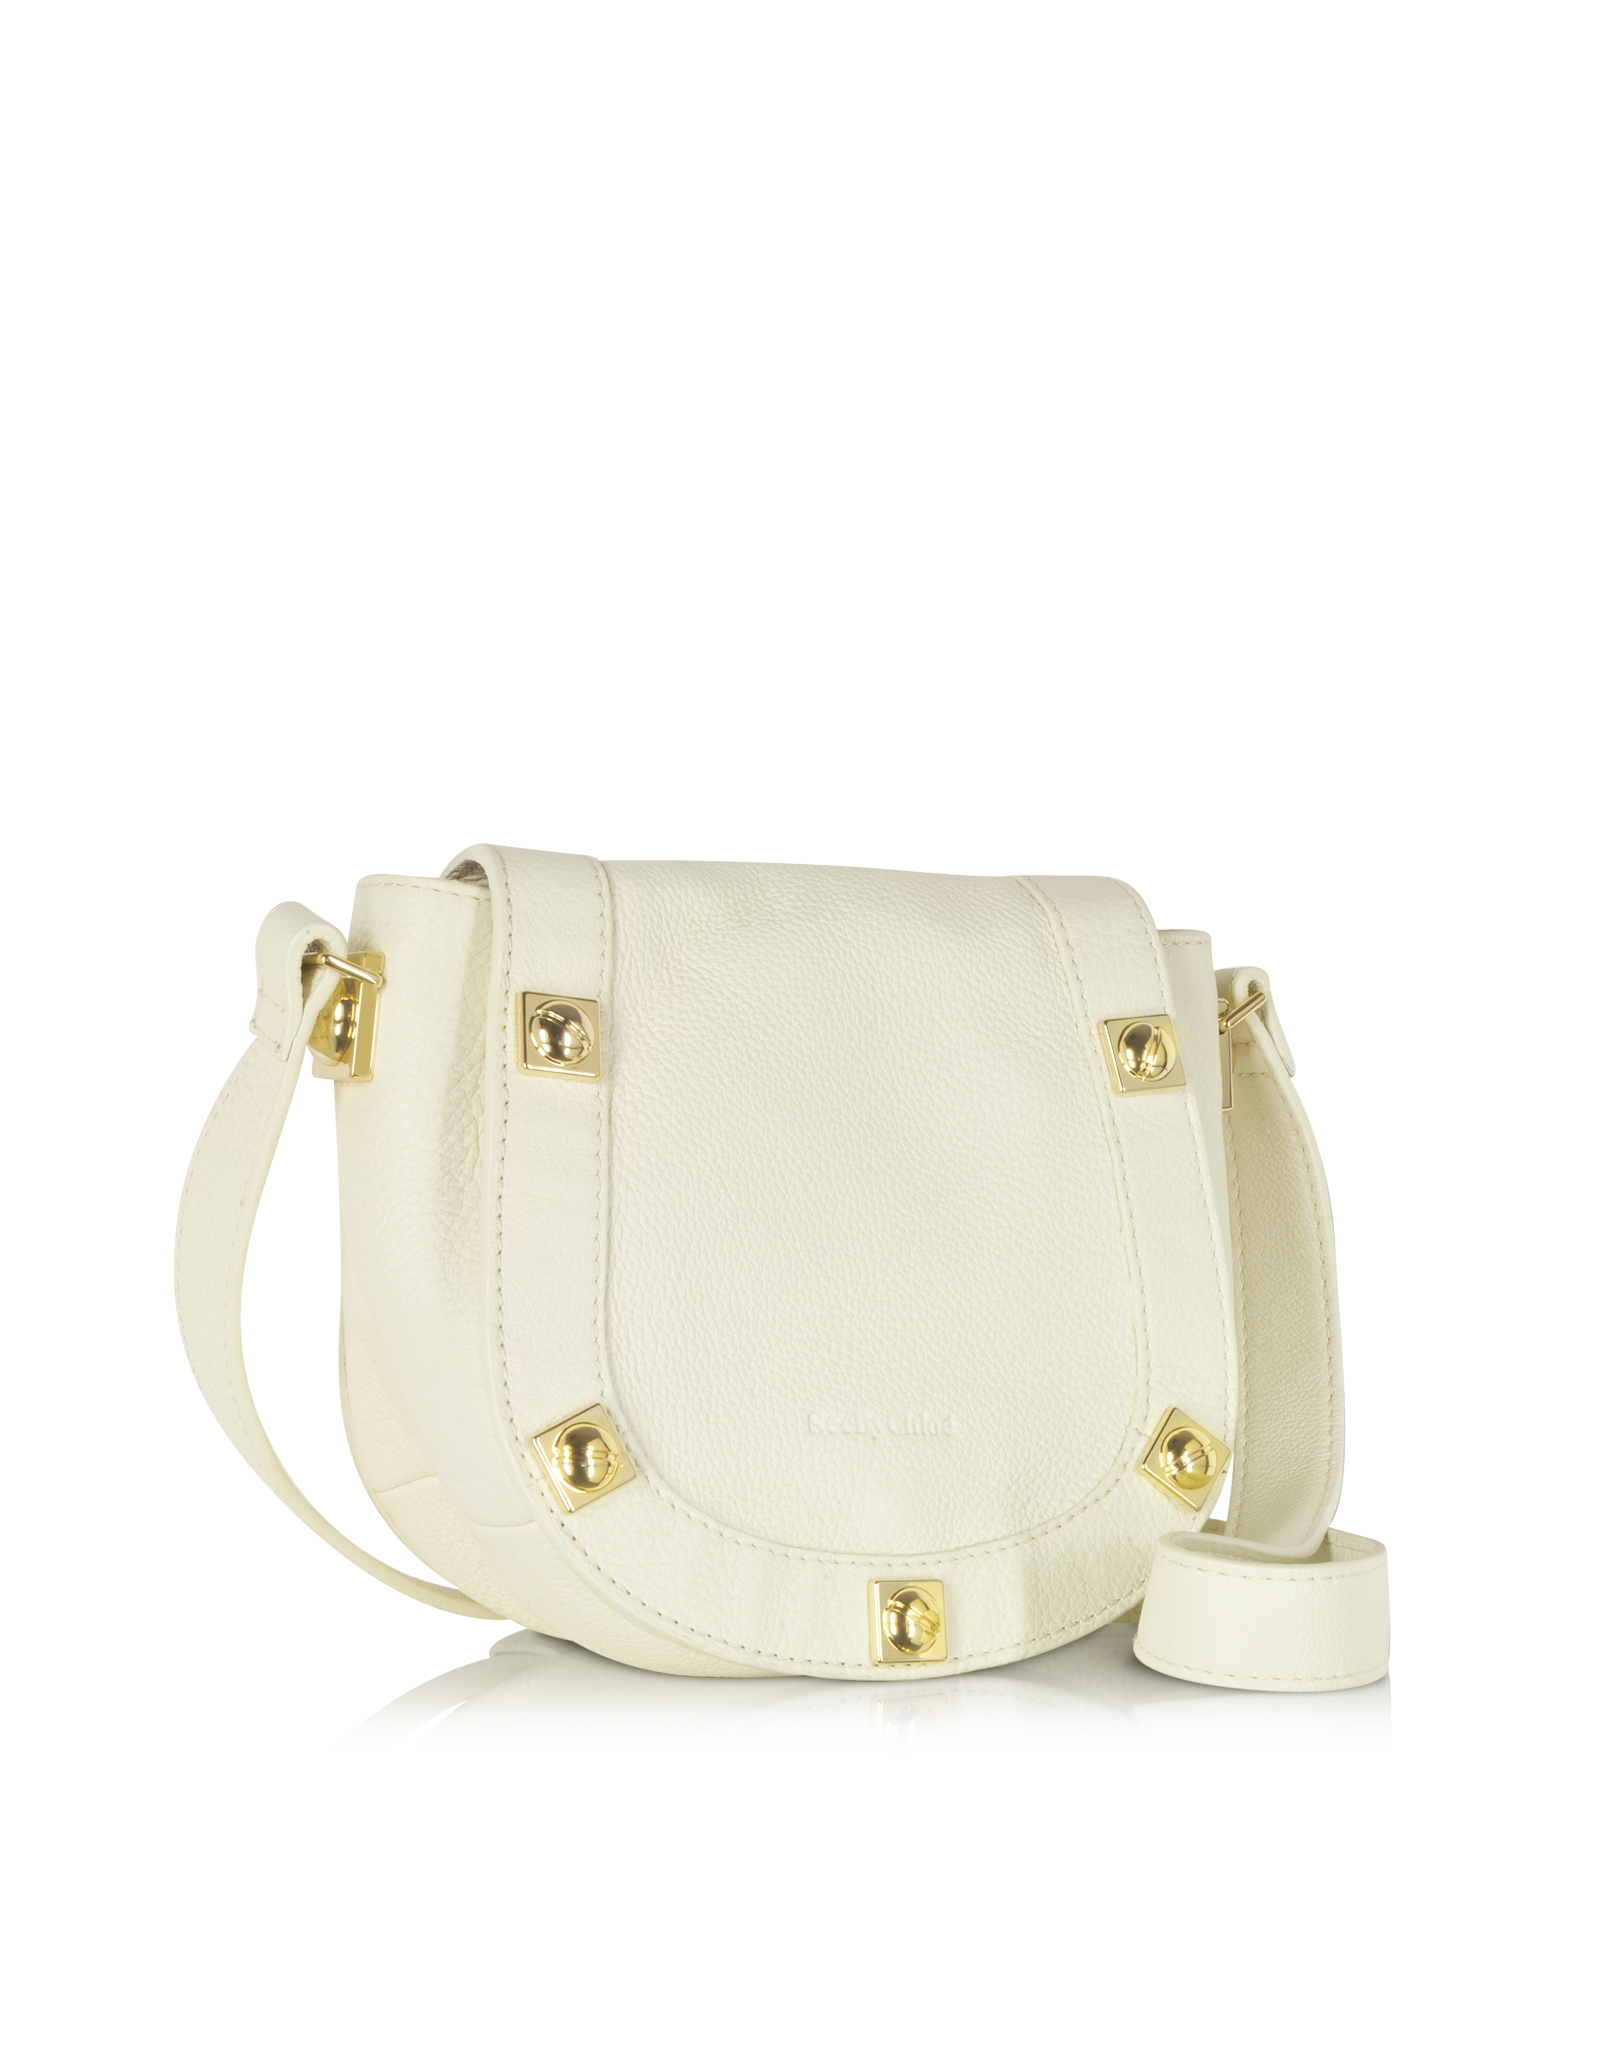 See by chlo¨¦ Sadie Milk Leather Mini Crossbody Bag in Beige (gold ...